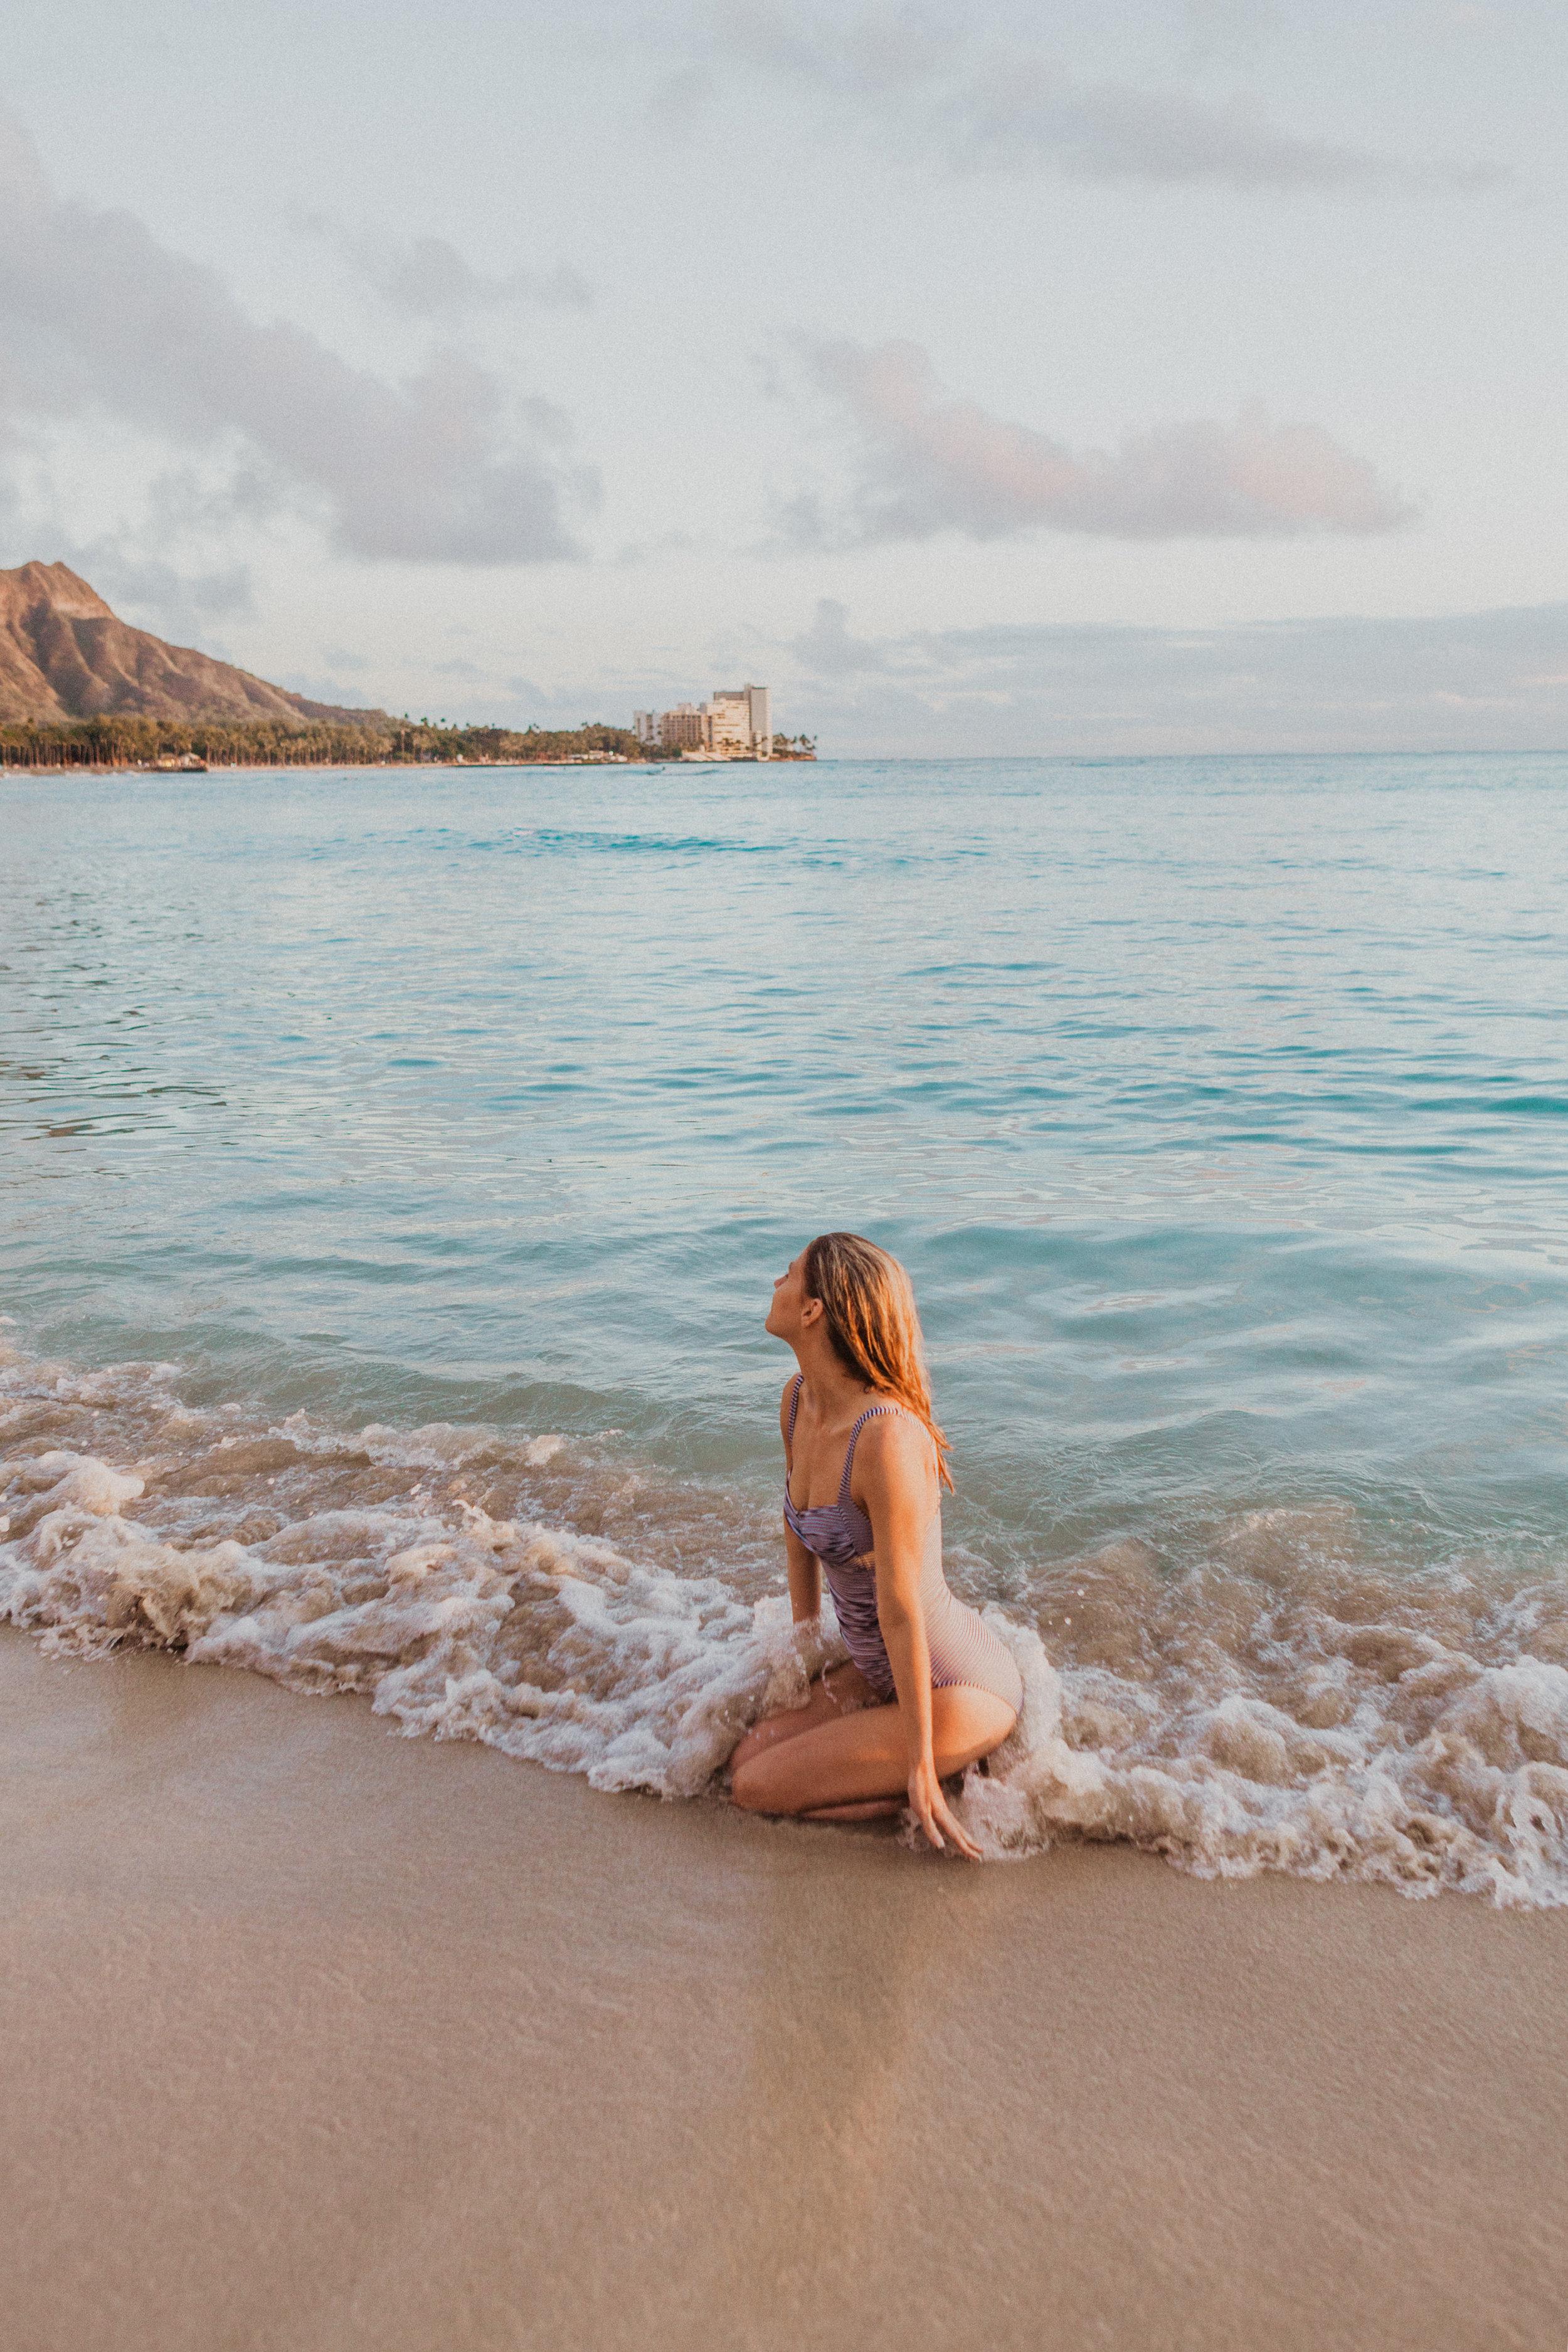 exploring in hawaii